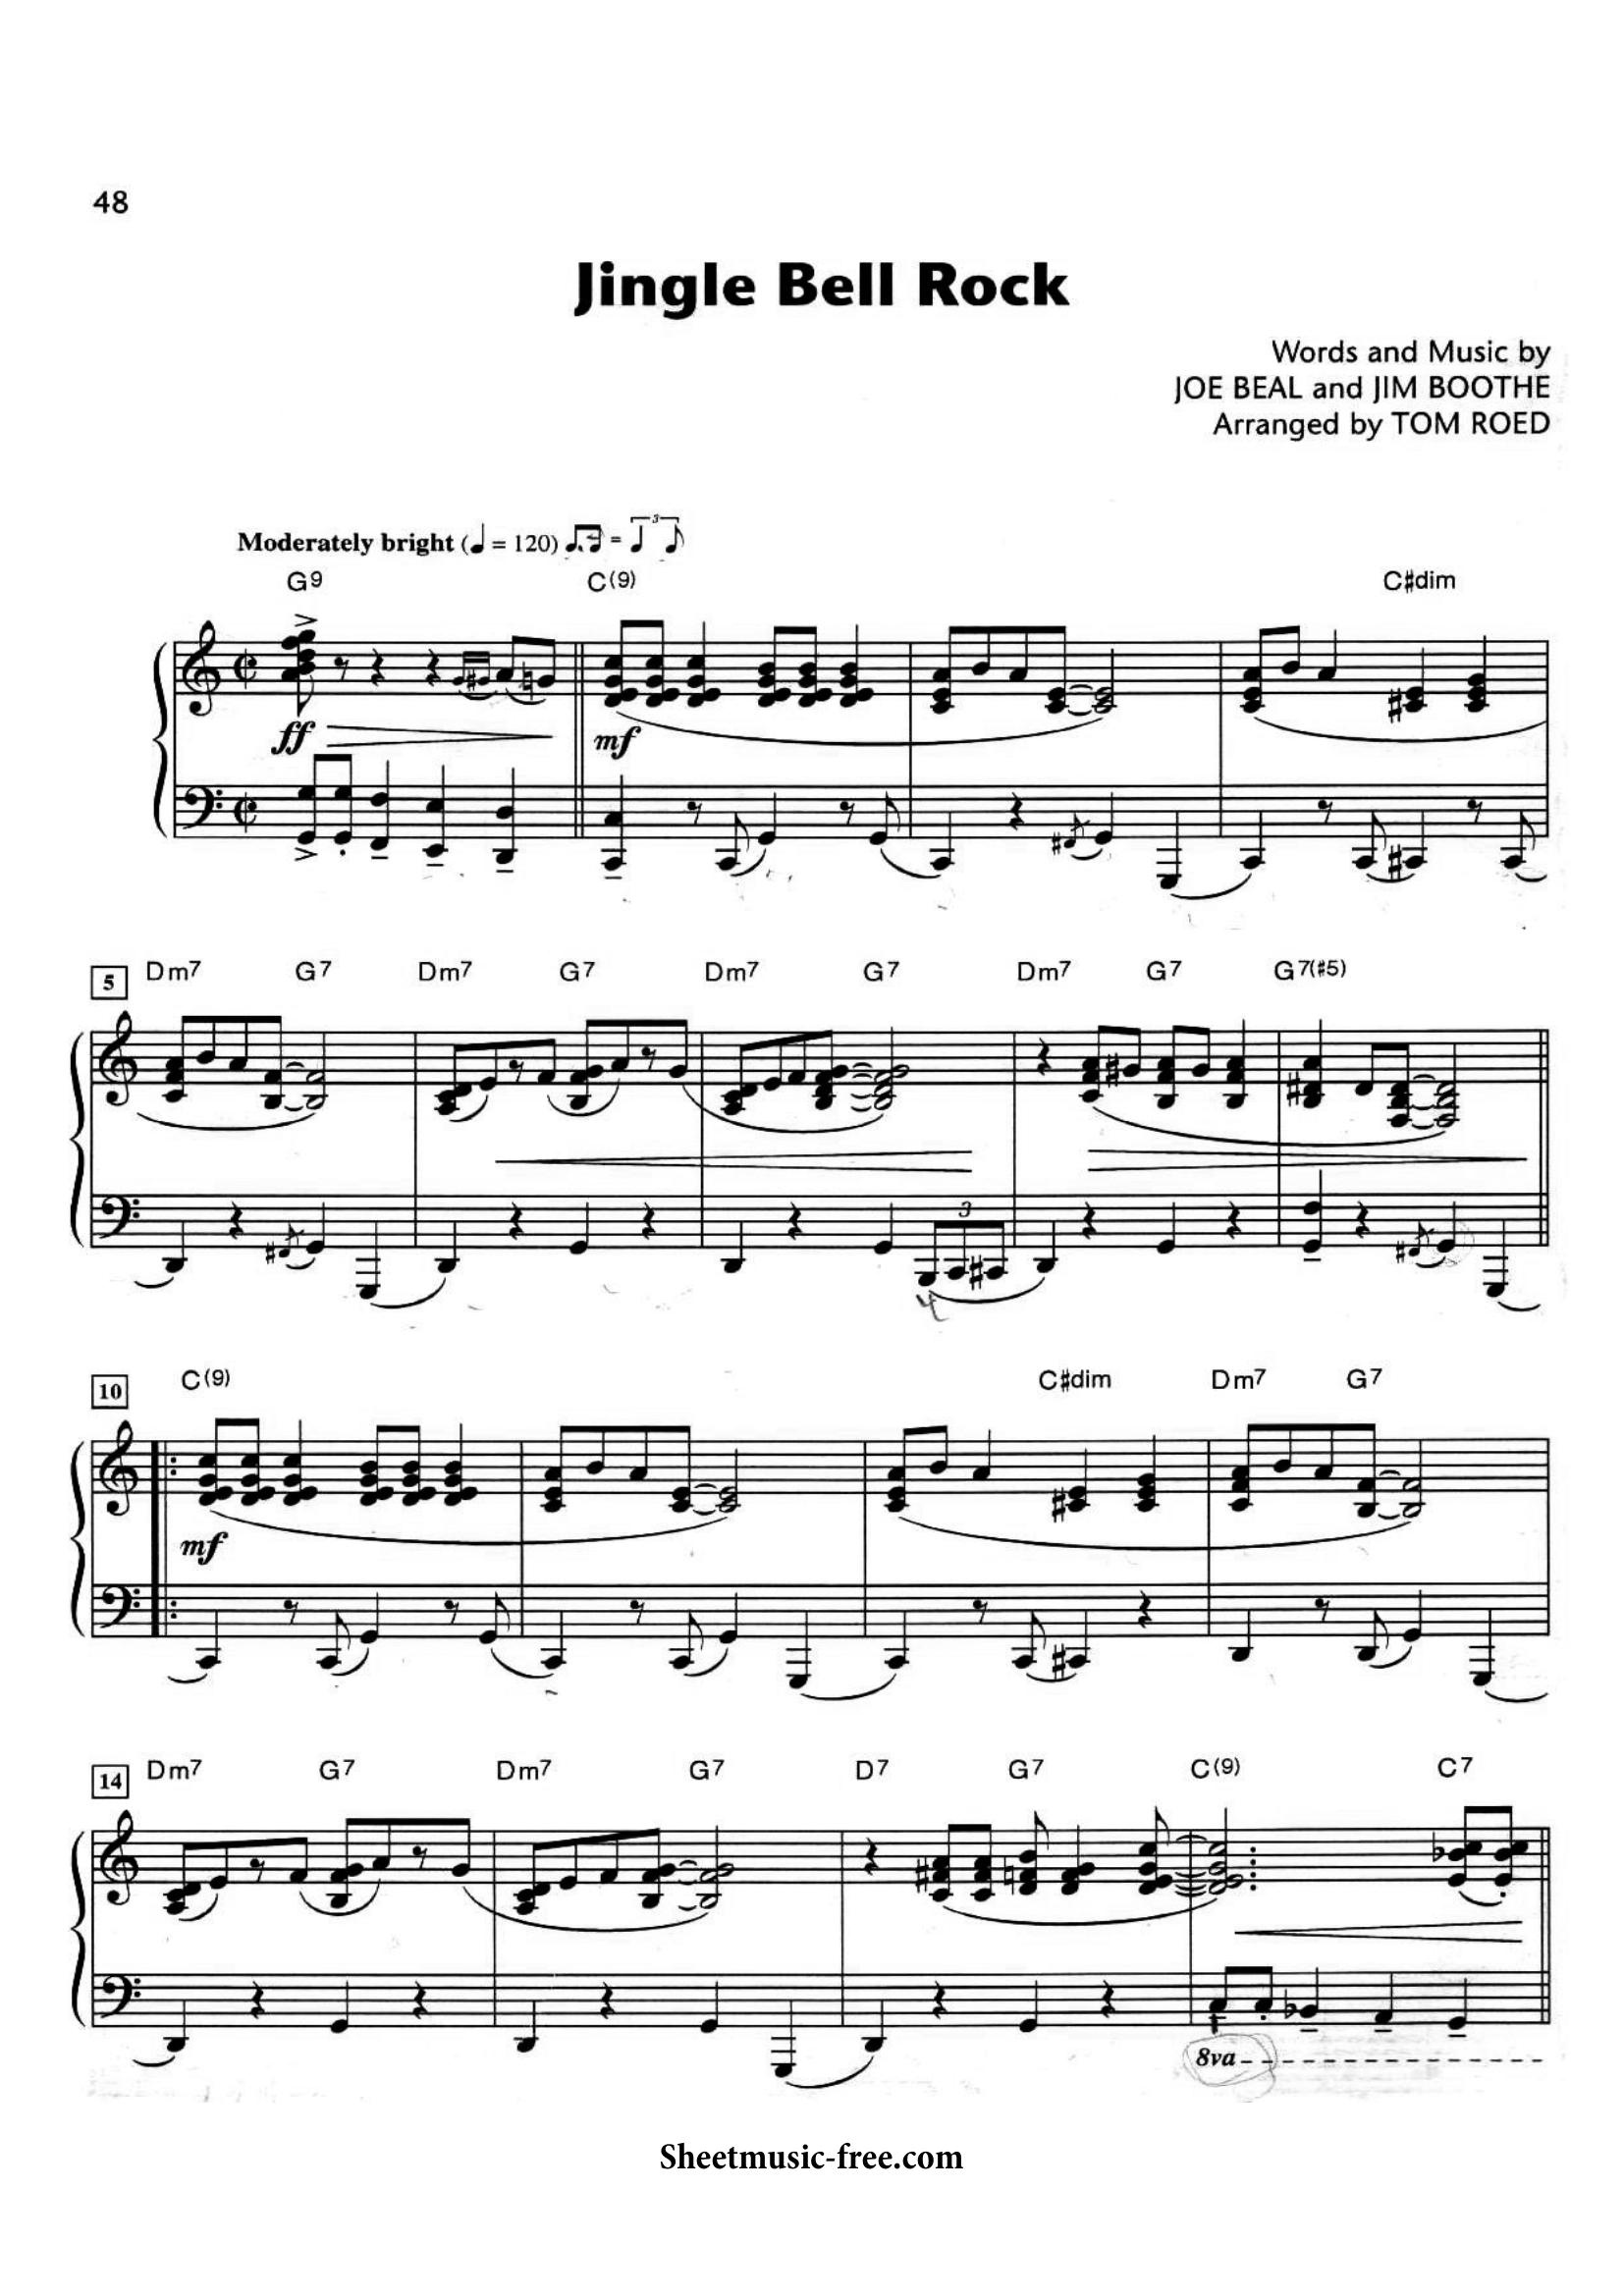 Jingle Bell Rock Sheets Page -1